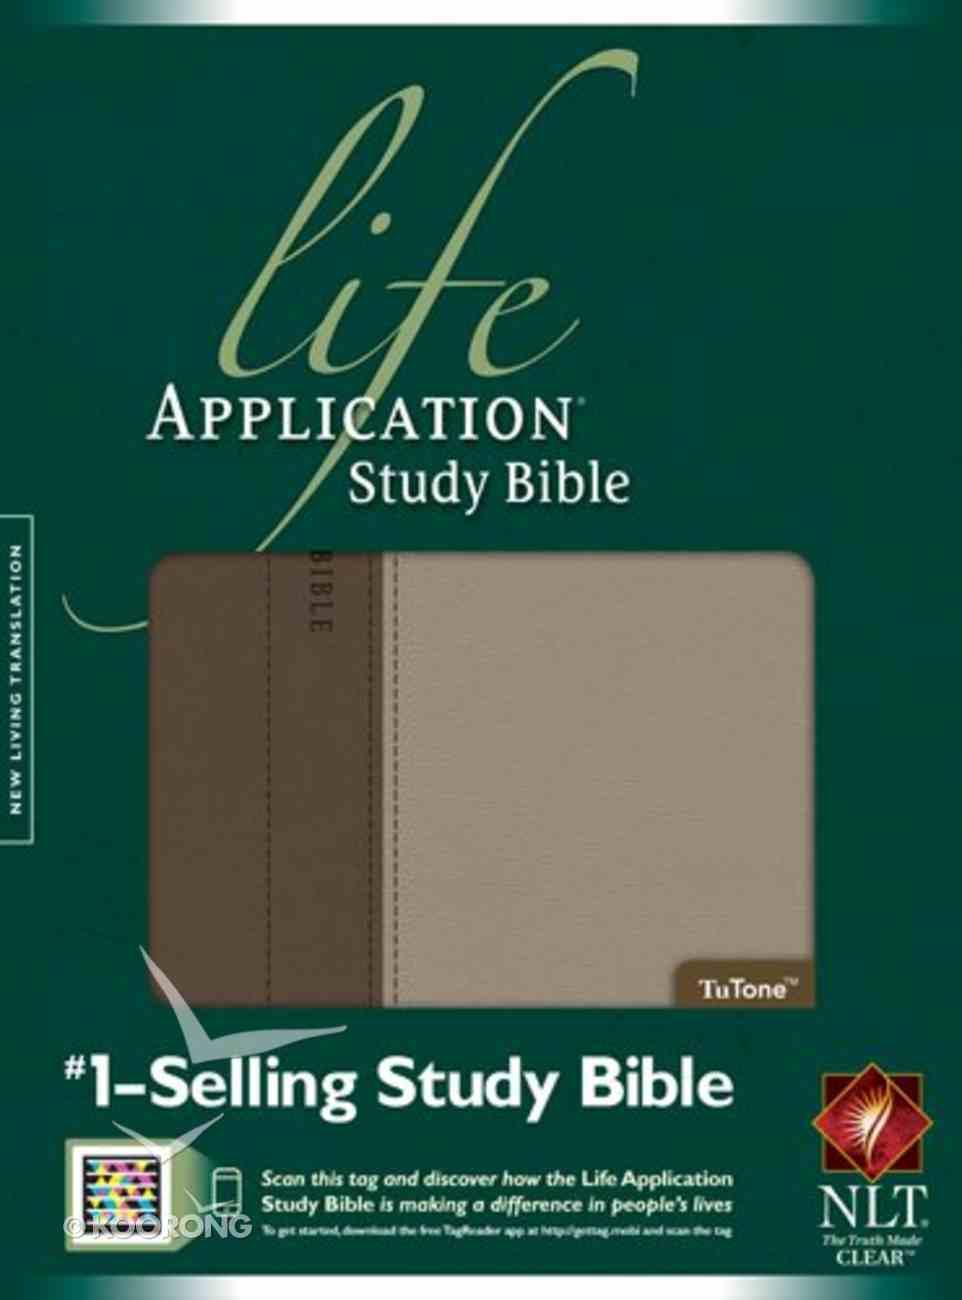 NLT Life Application Study Bible Taupe Stone Thumb-Indexed Imitation Leather